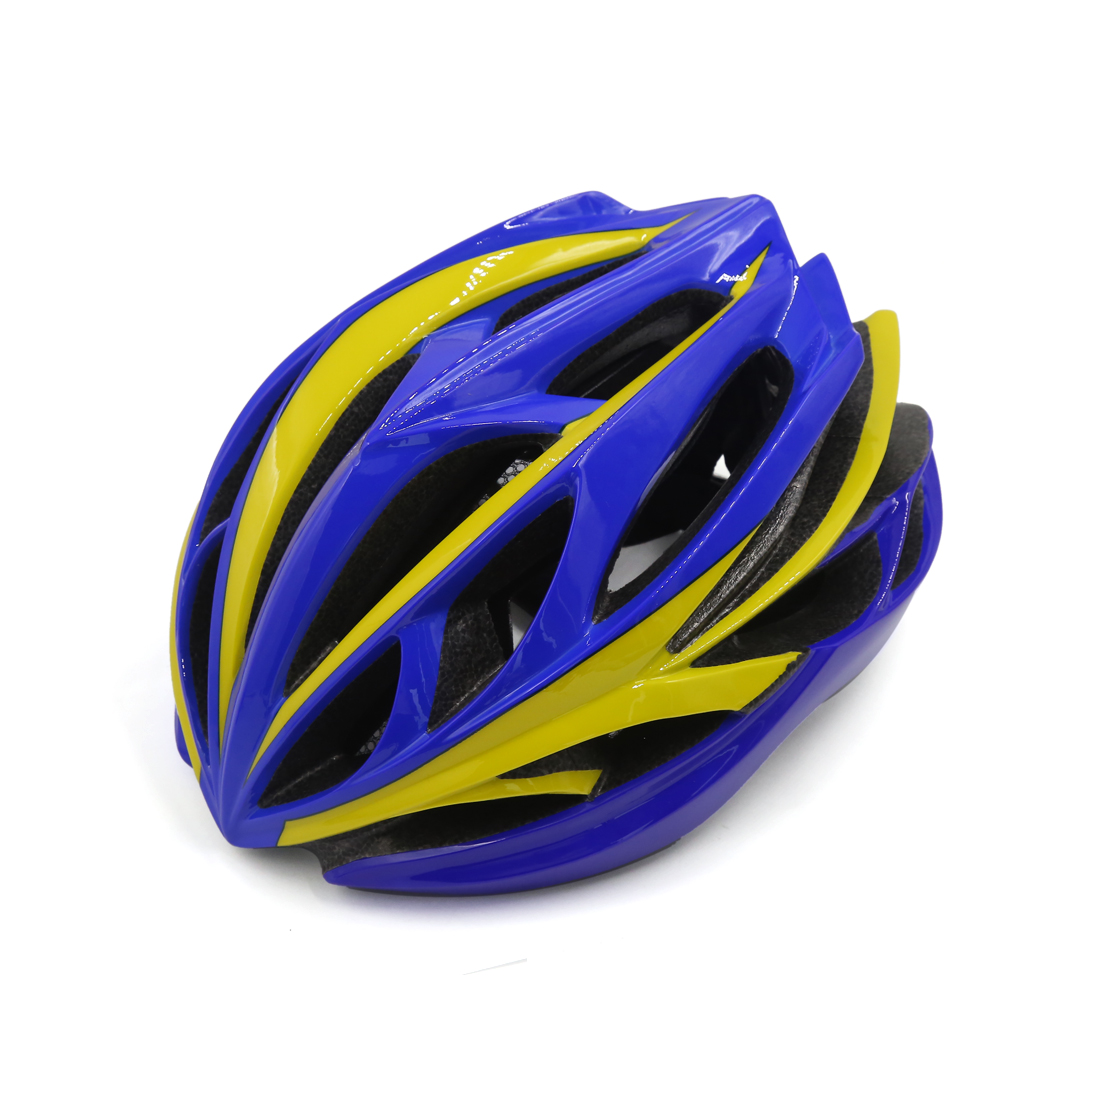 Unisex Adult MTB Mountain Bike Bicycle Cycling Shockproof Helmet Yellow Blue